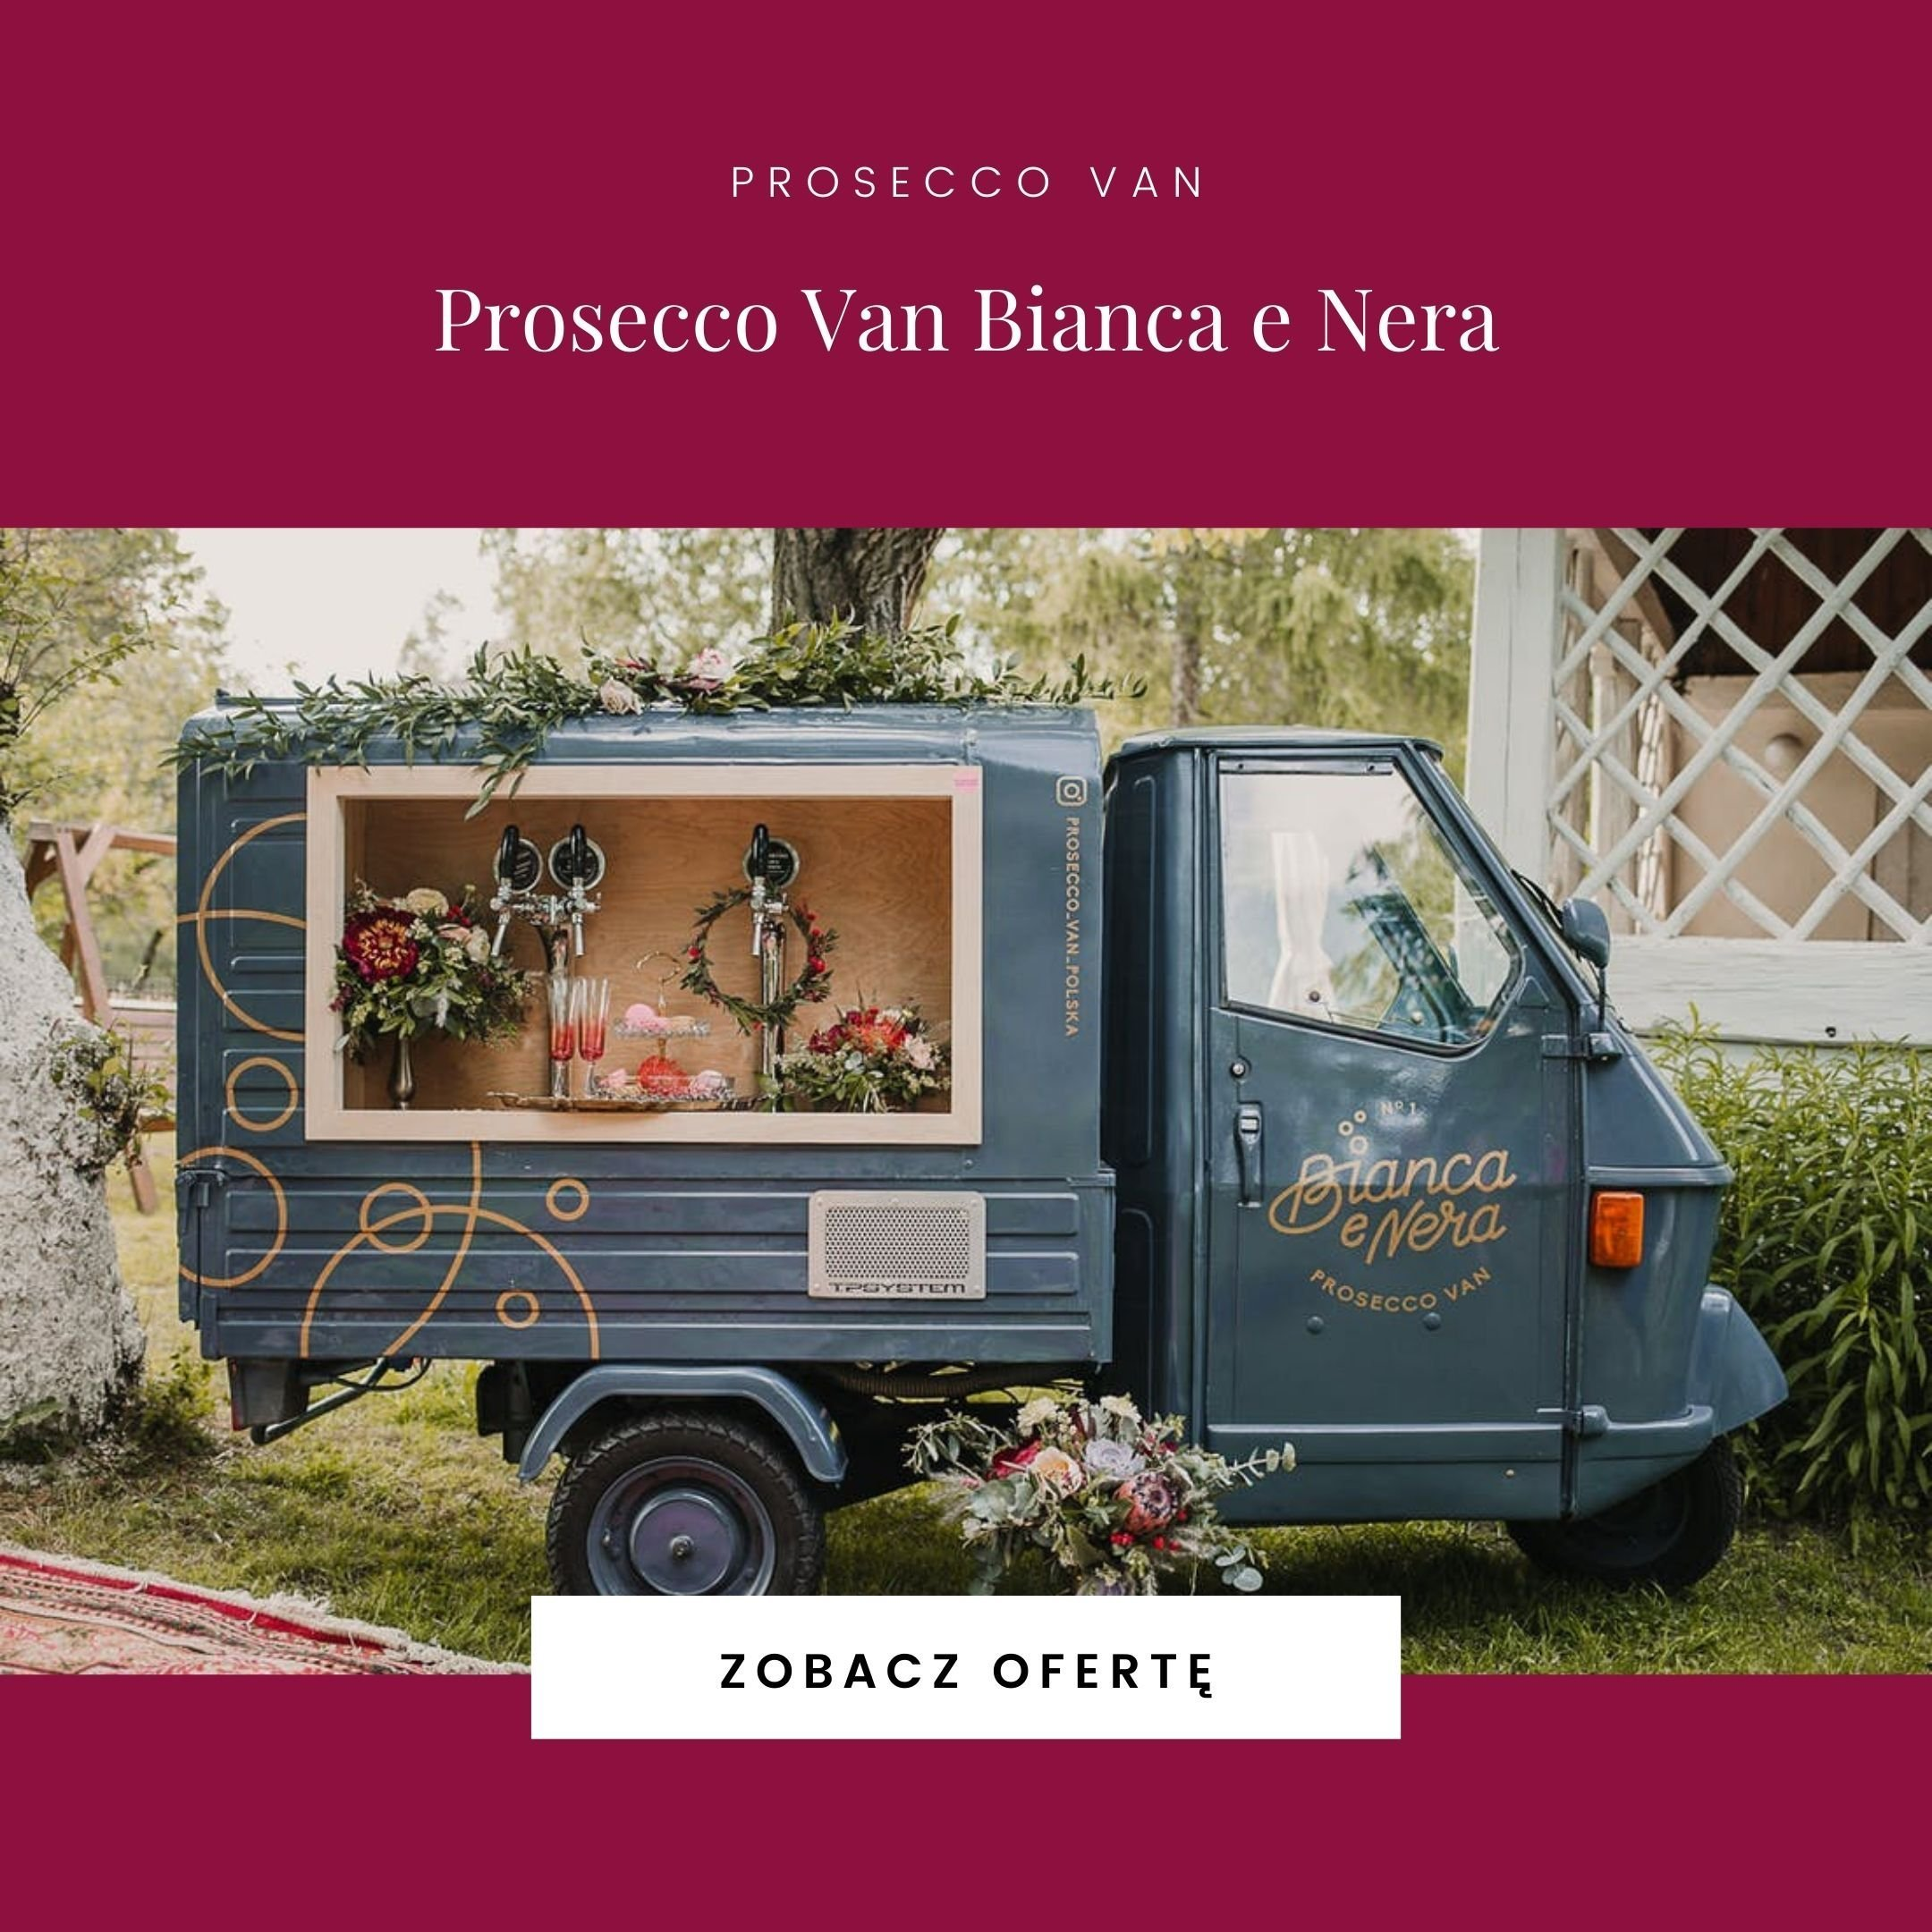 Prosecco Van Bianca e Nera